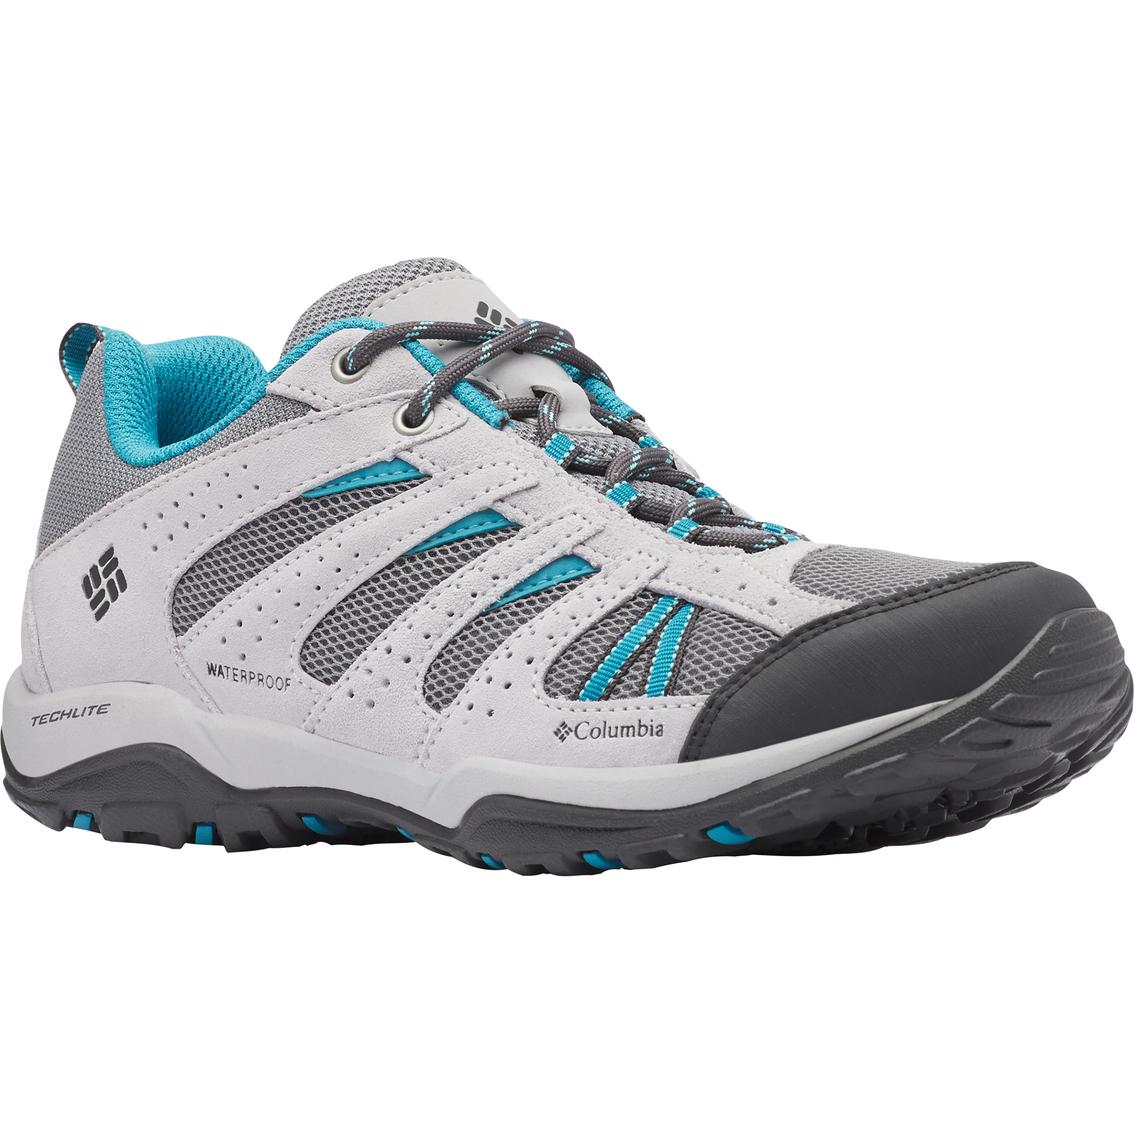 Dakota Drifter Waterproof Shoes